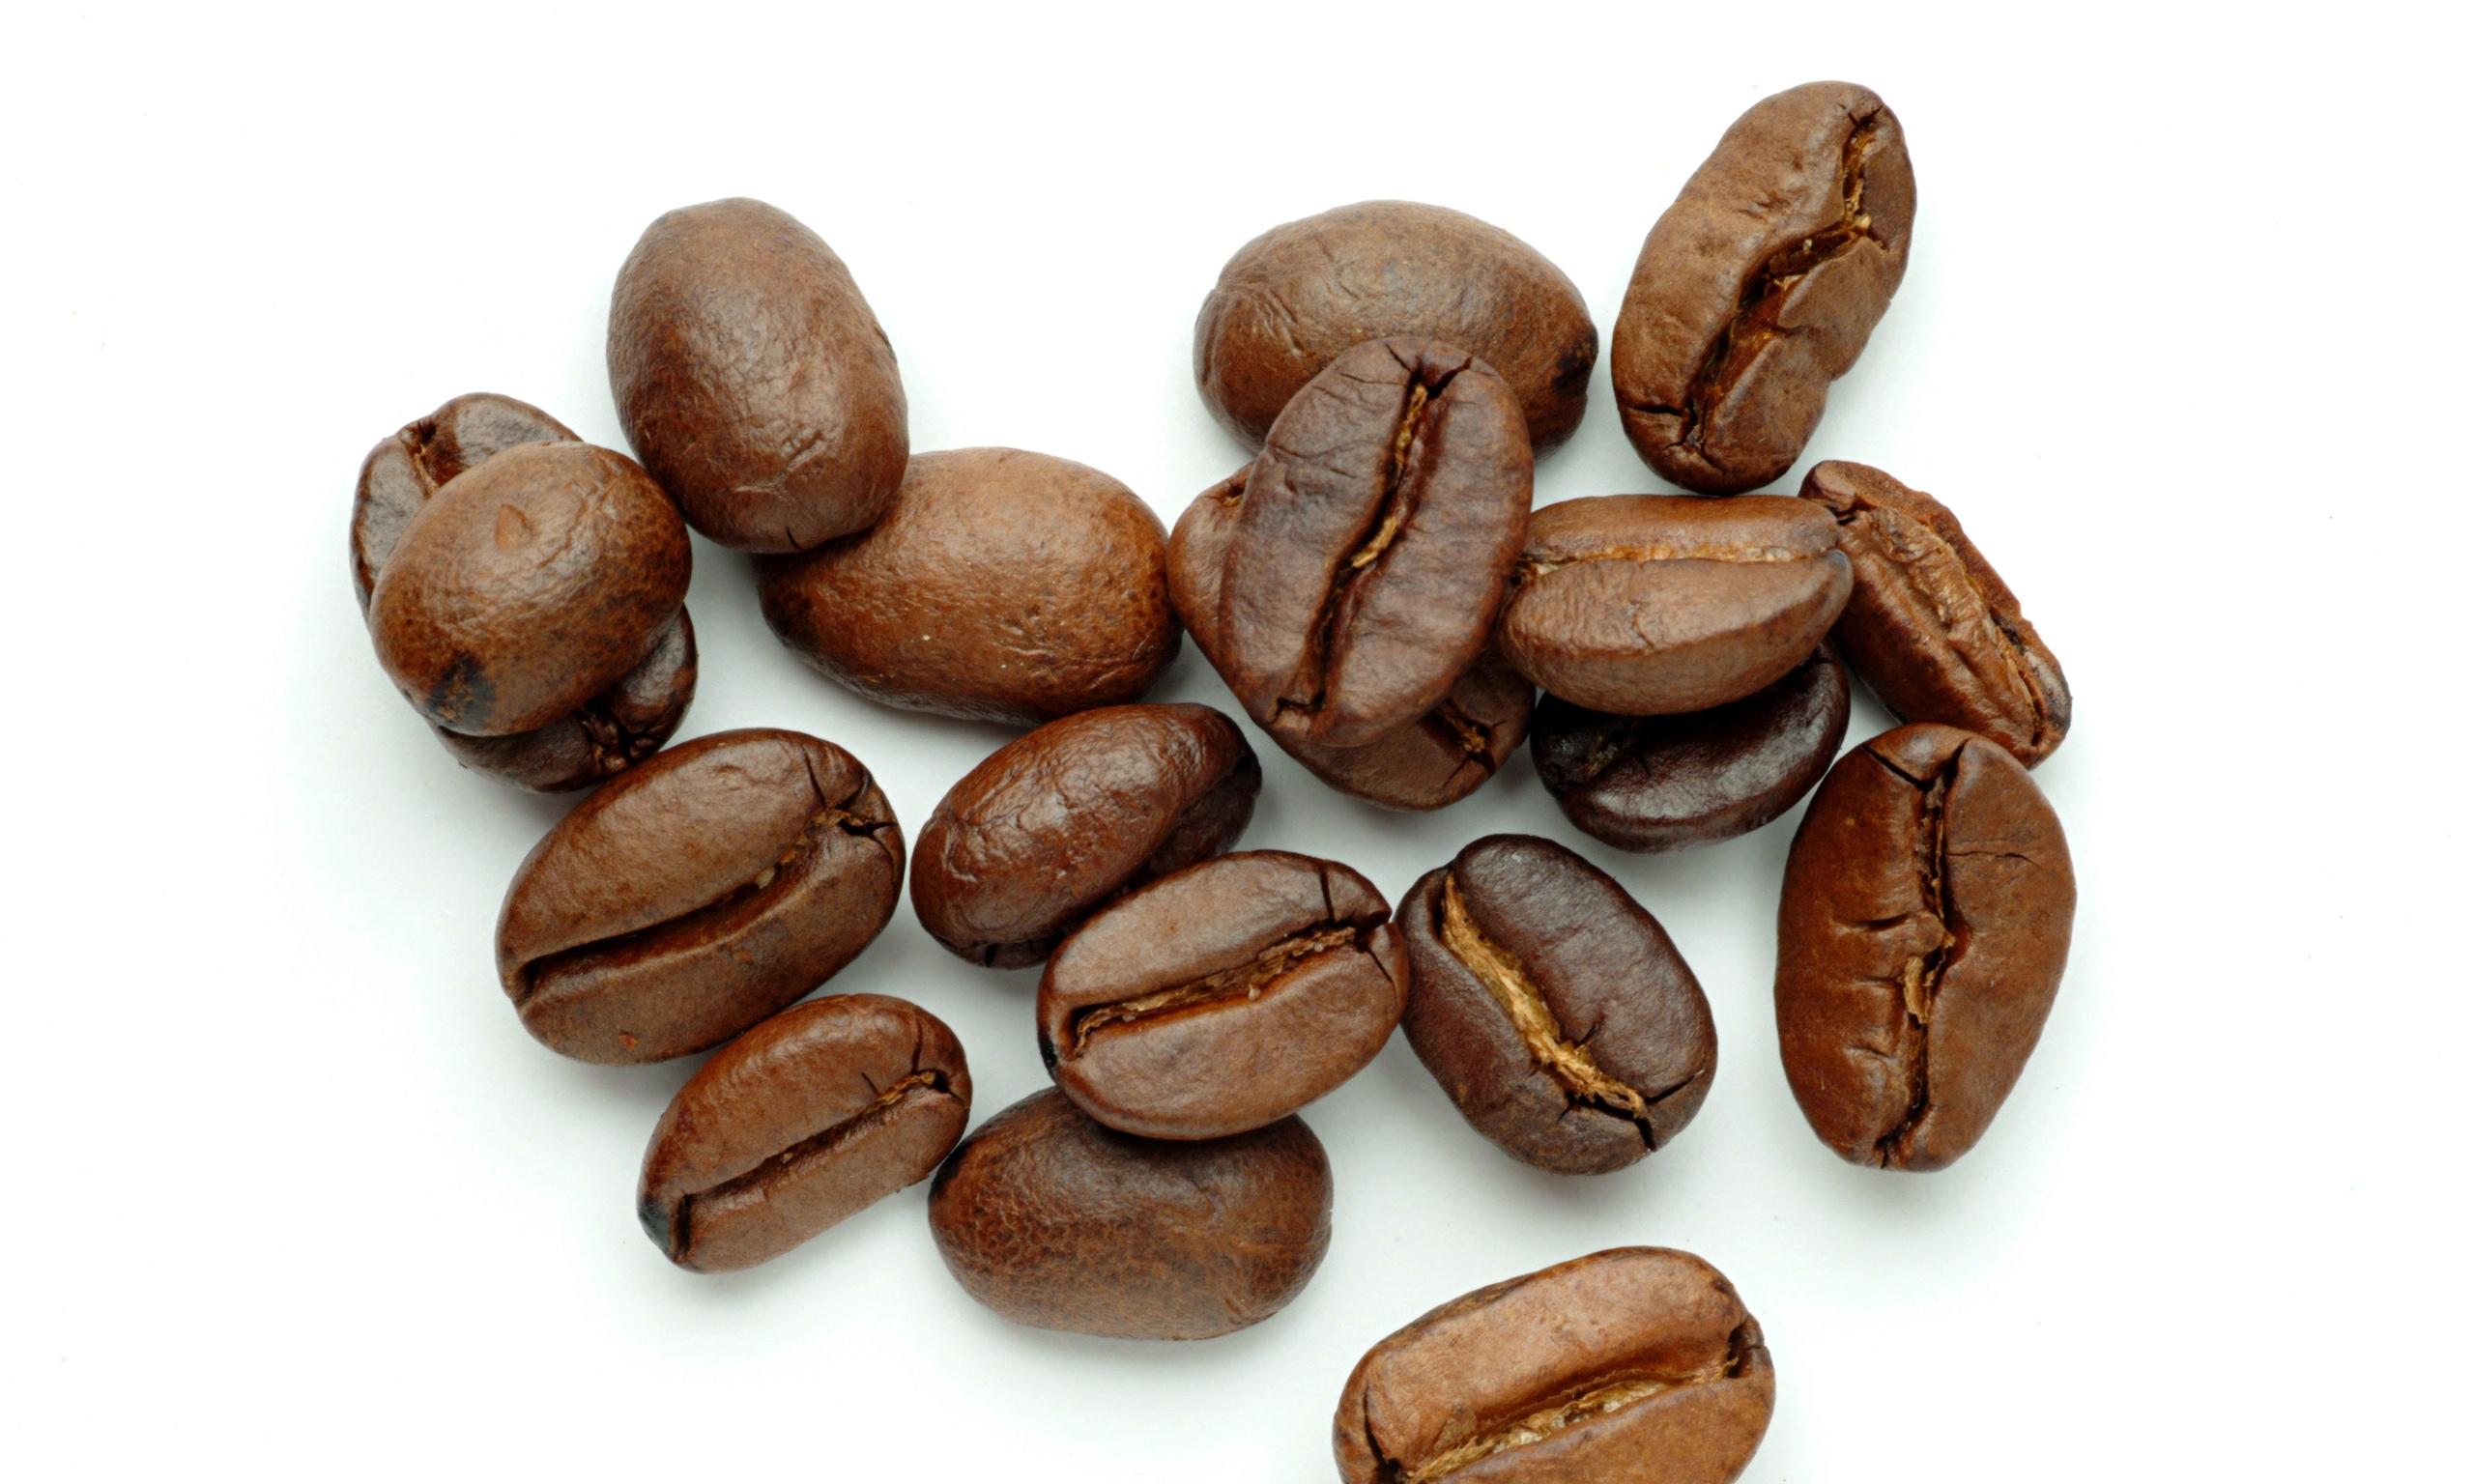 roasted-coffee-beans-014.jpg